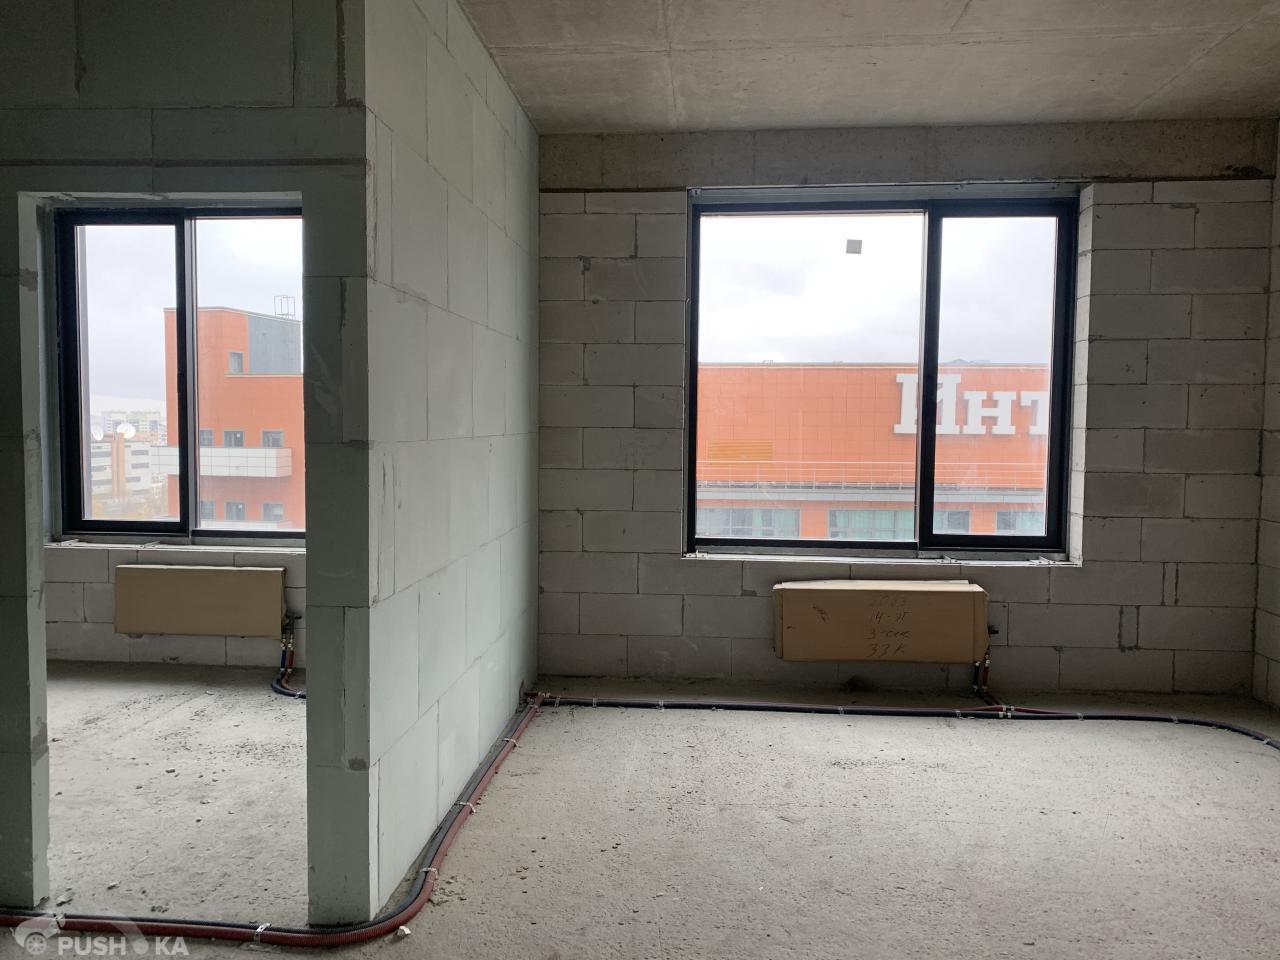 Продаётся 2-комнатная квартира 63.0 кв.м. этаж 14/27 за 16 300 000 руб